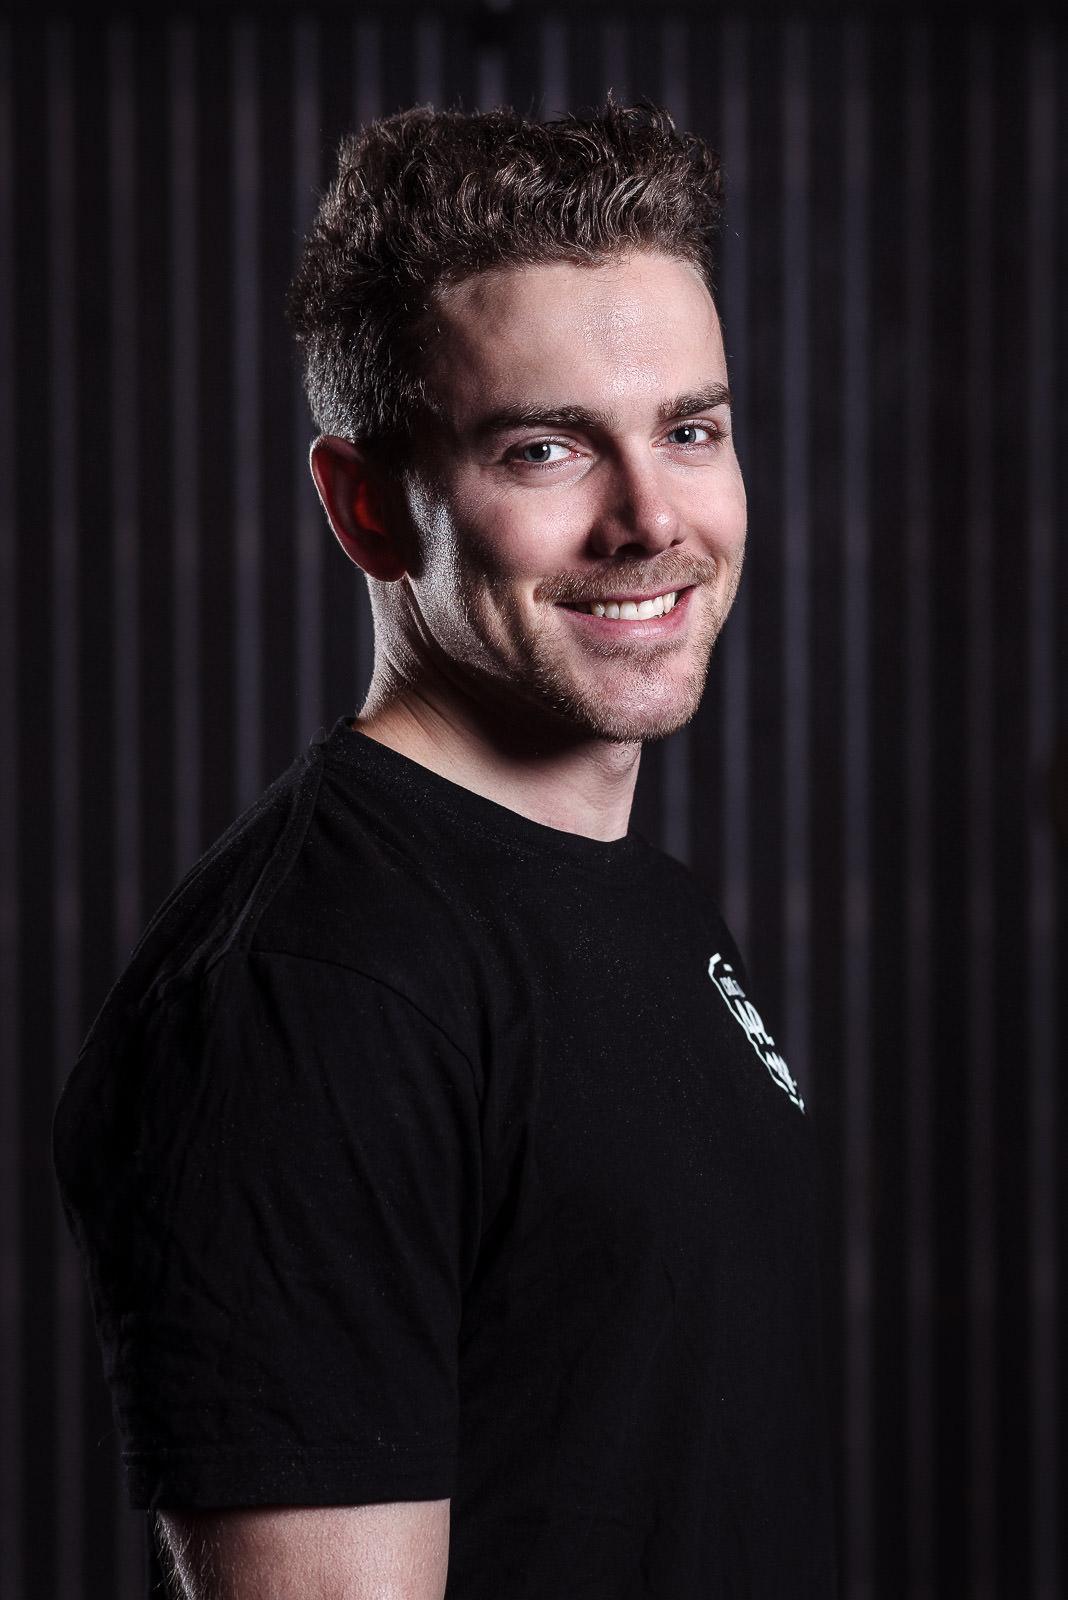 STC-CrossFit442-Wallfoto_161218_002